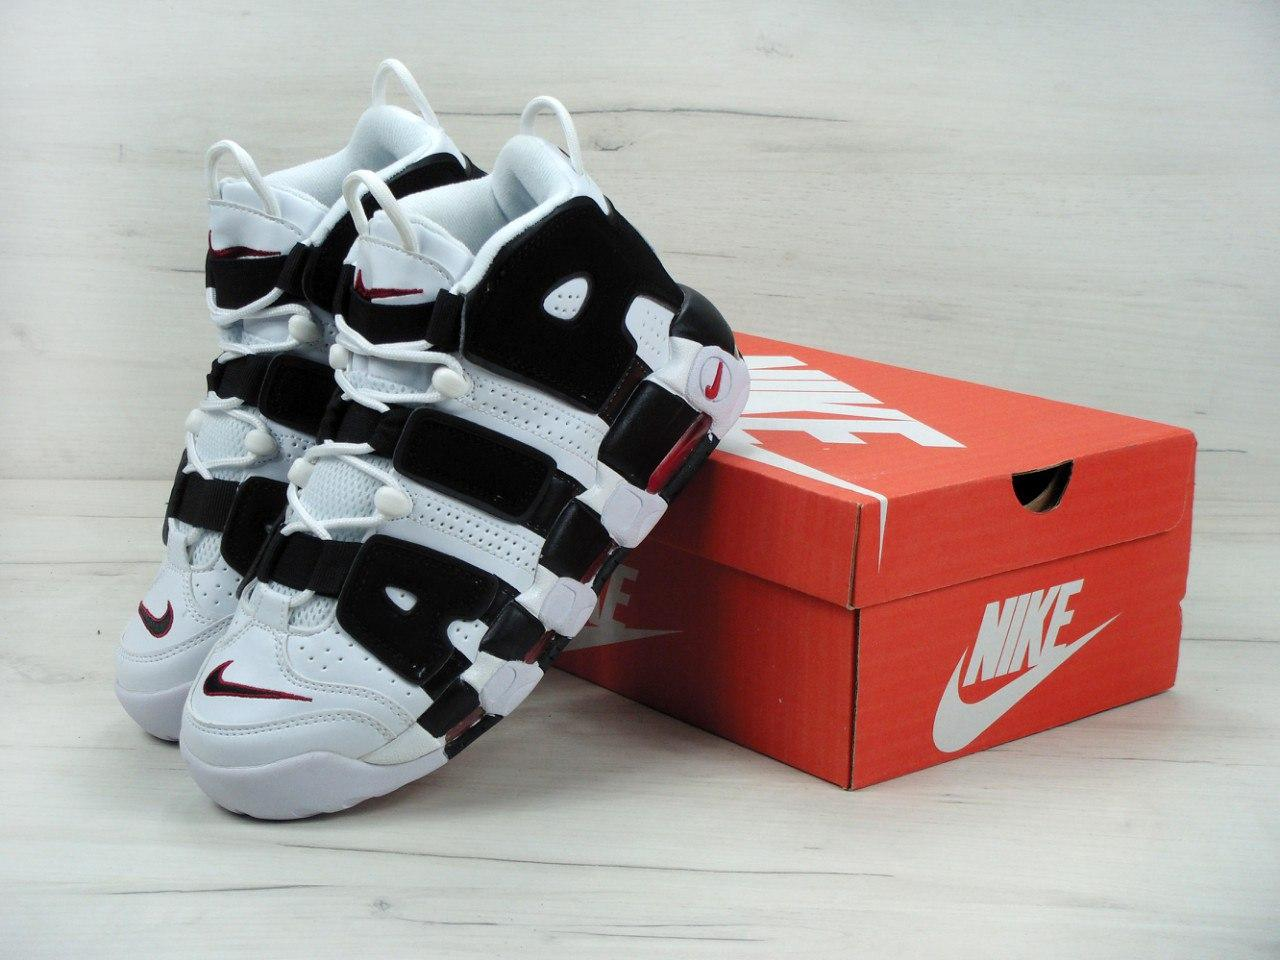 Женские кроссовки Nike Air More Uptempo Black White - Обувь и одежда с  доставкой по 9f53e8674b75f